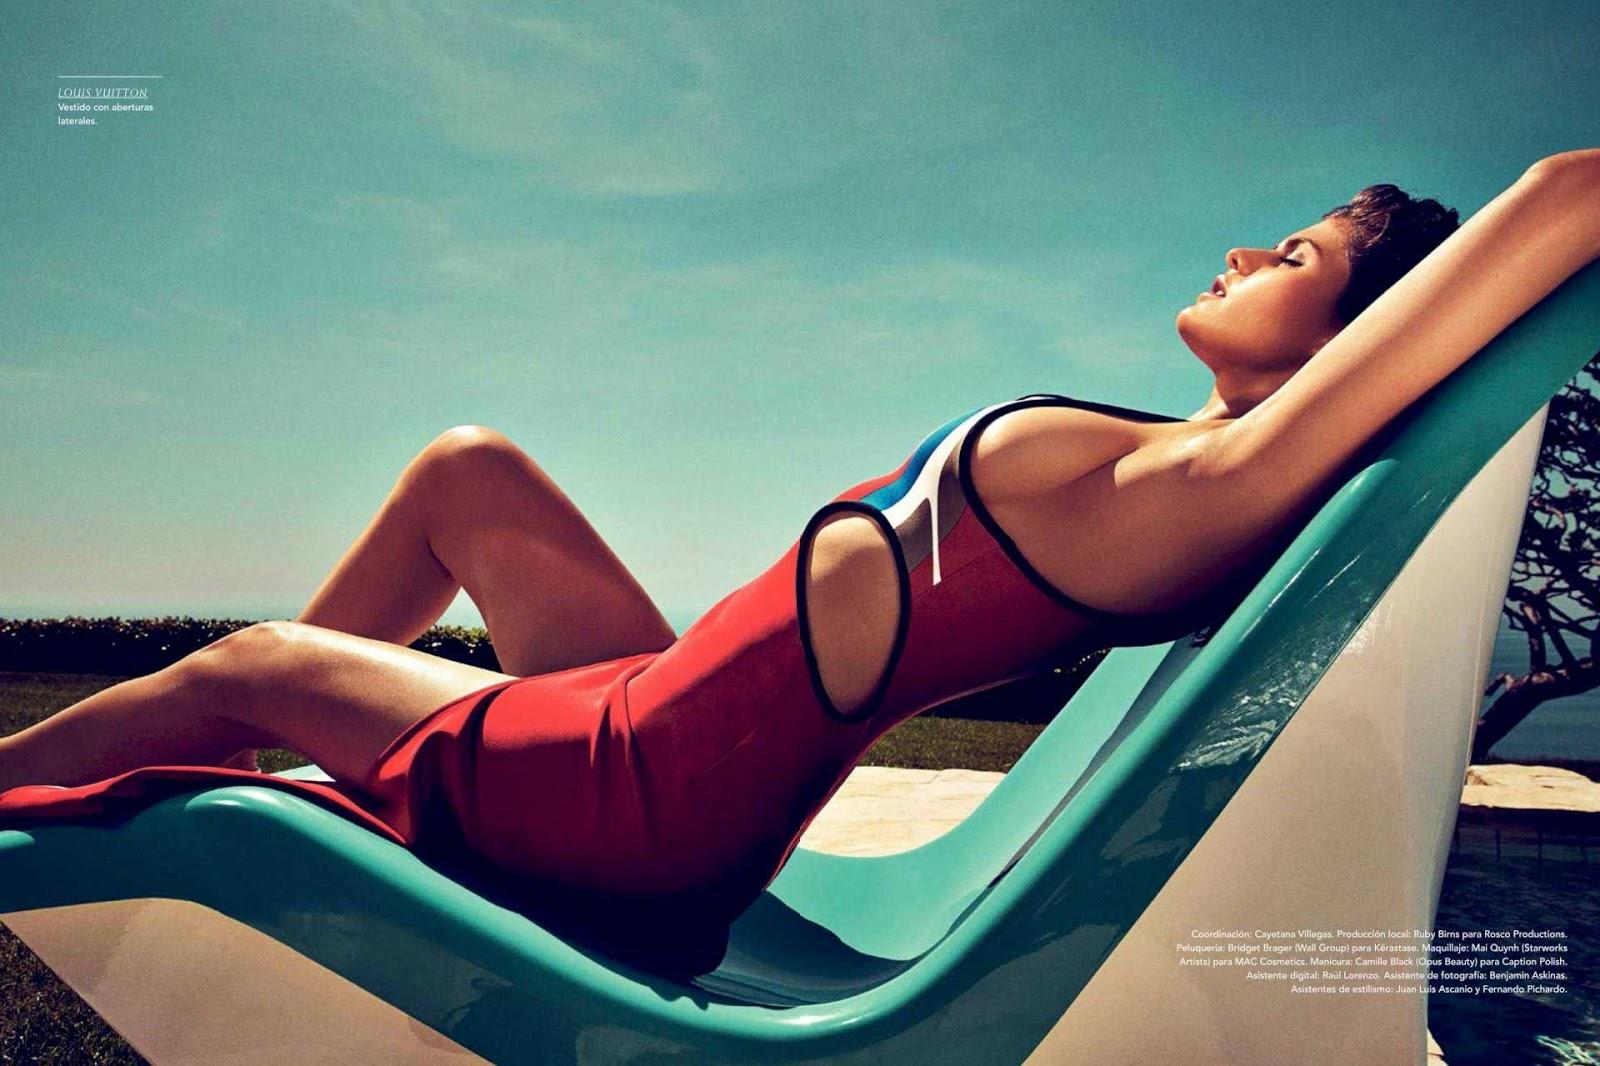 Alexandra Daddario in GQ Spain Magazine – July/August 2017